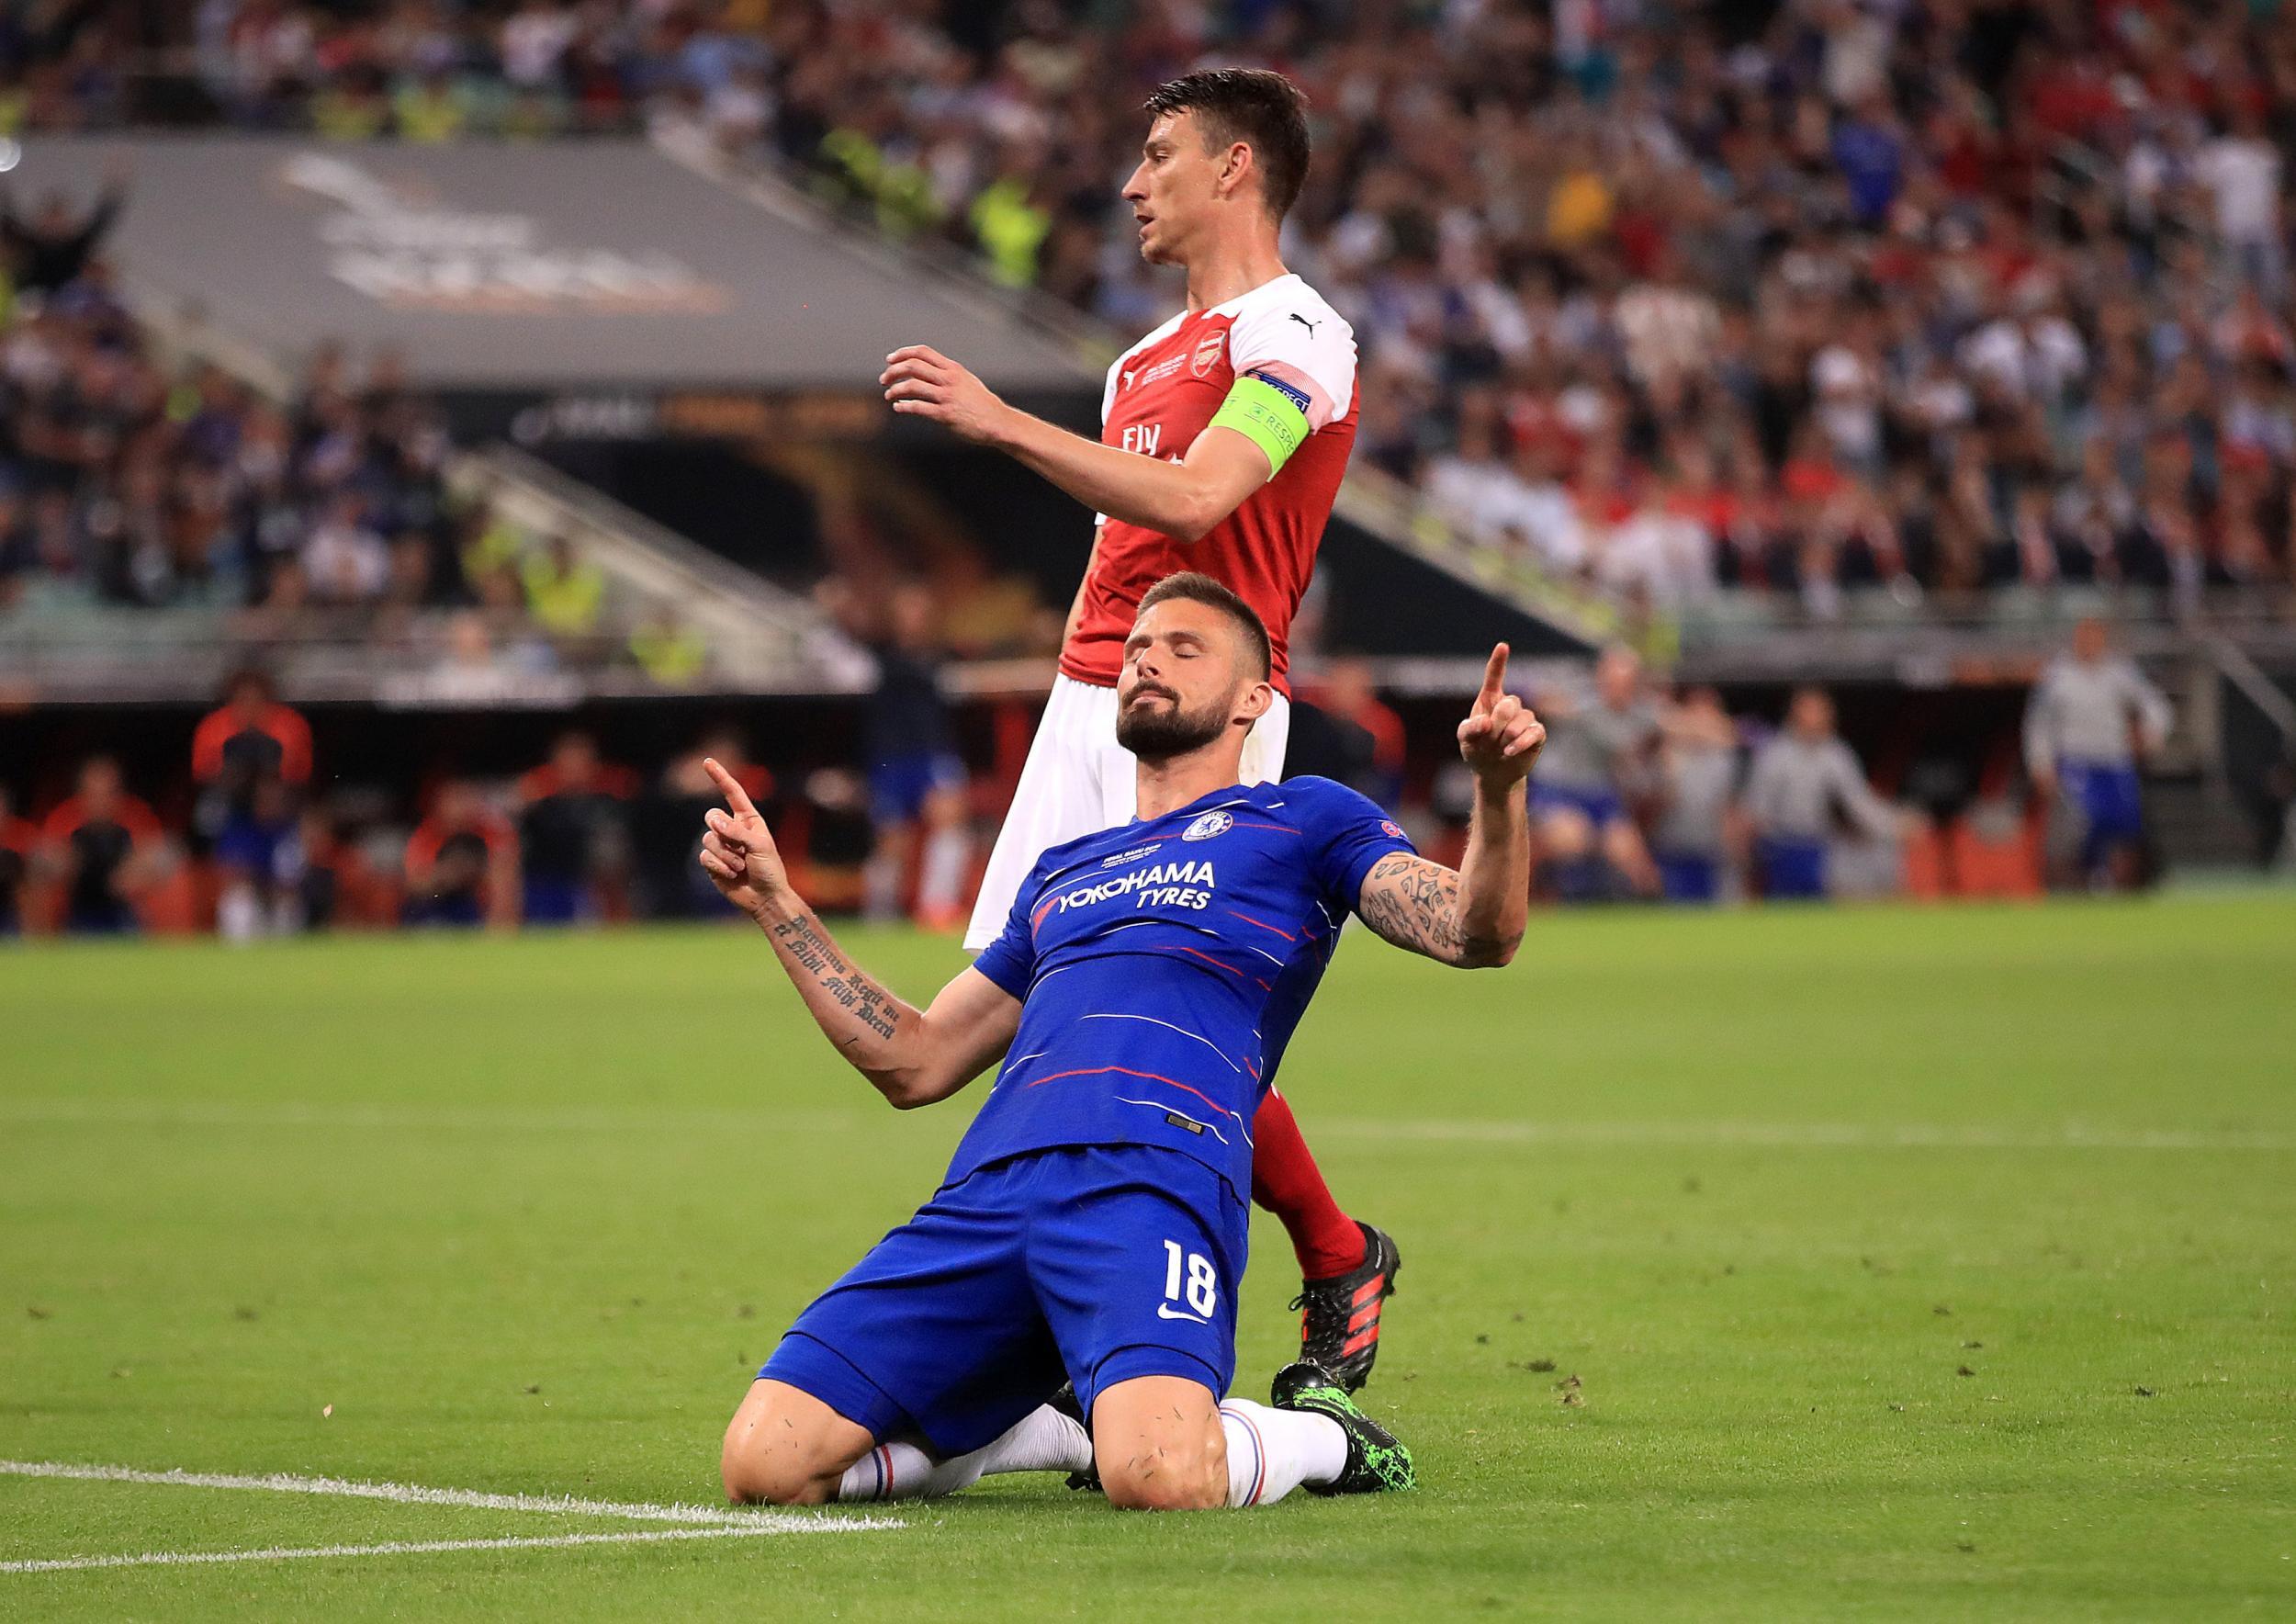 Giroud seems to have mocked Arsenal celebrating Europa League win - Tribuna.com